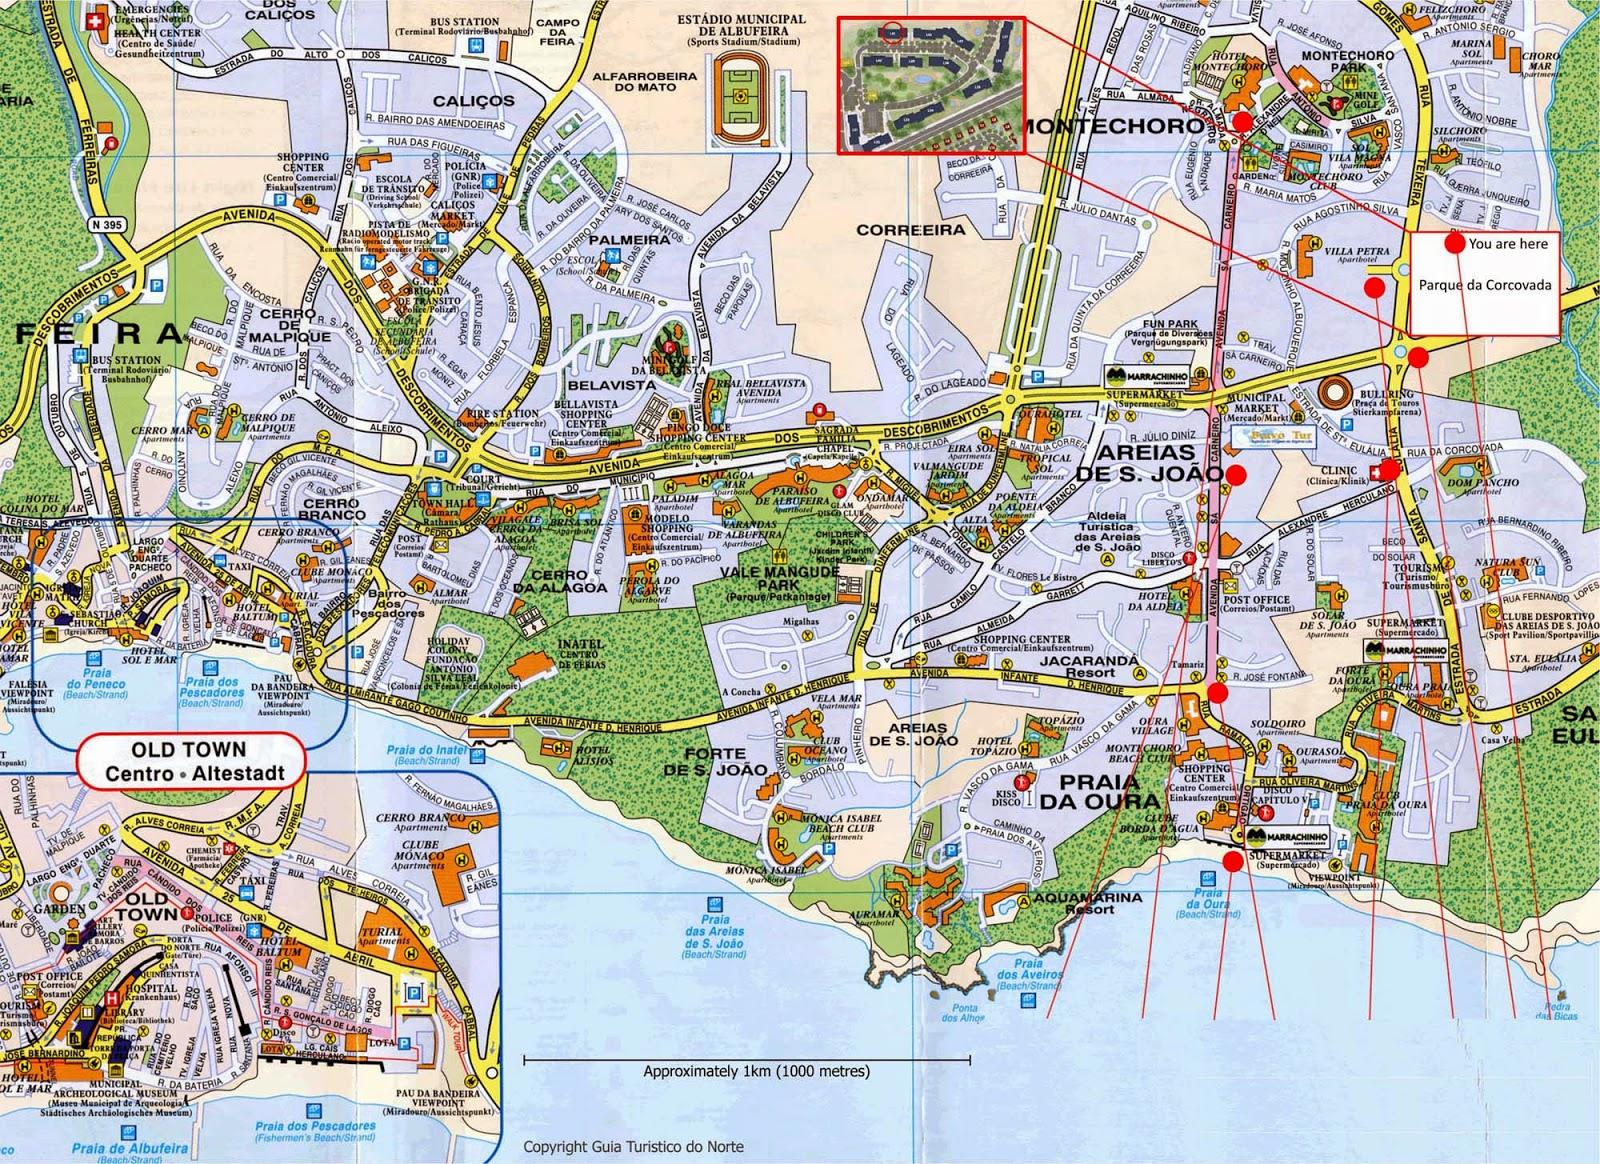 mapa albufeira map albufeira algarve mapa albufeira